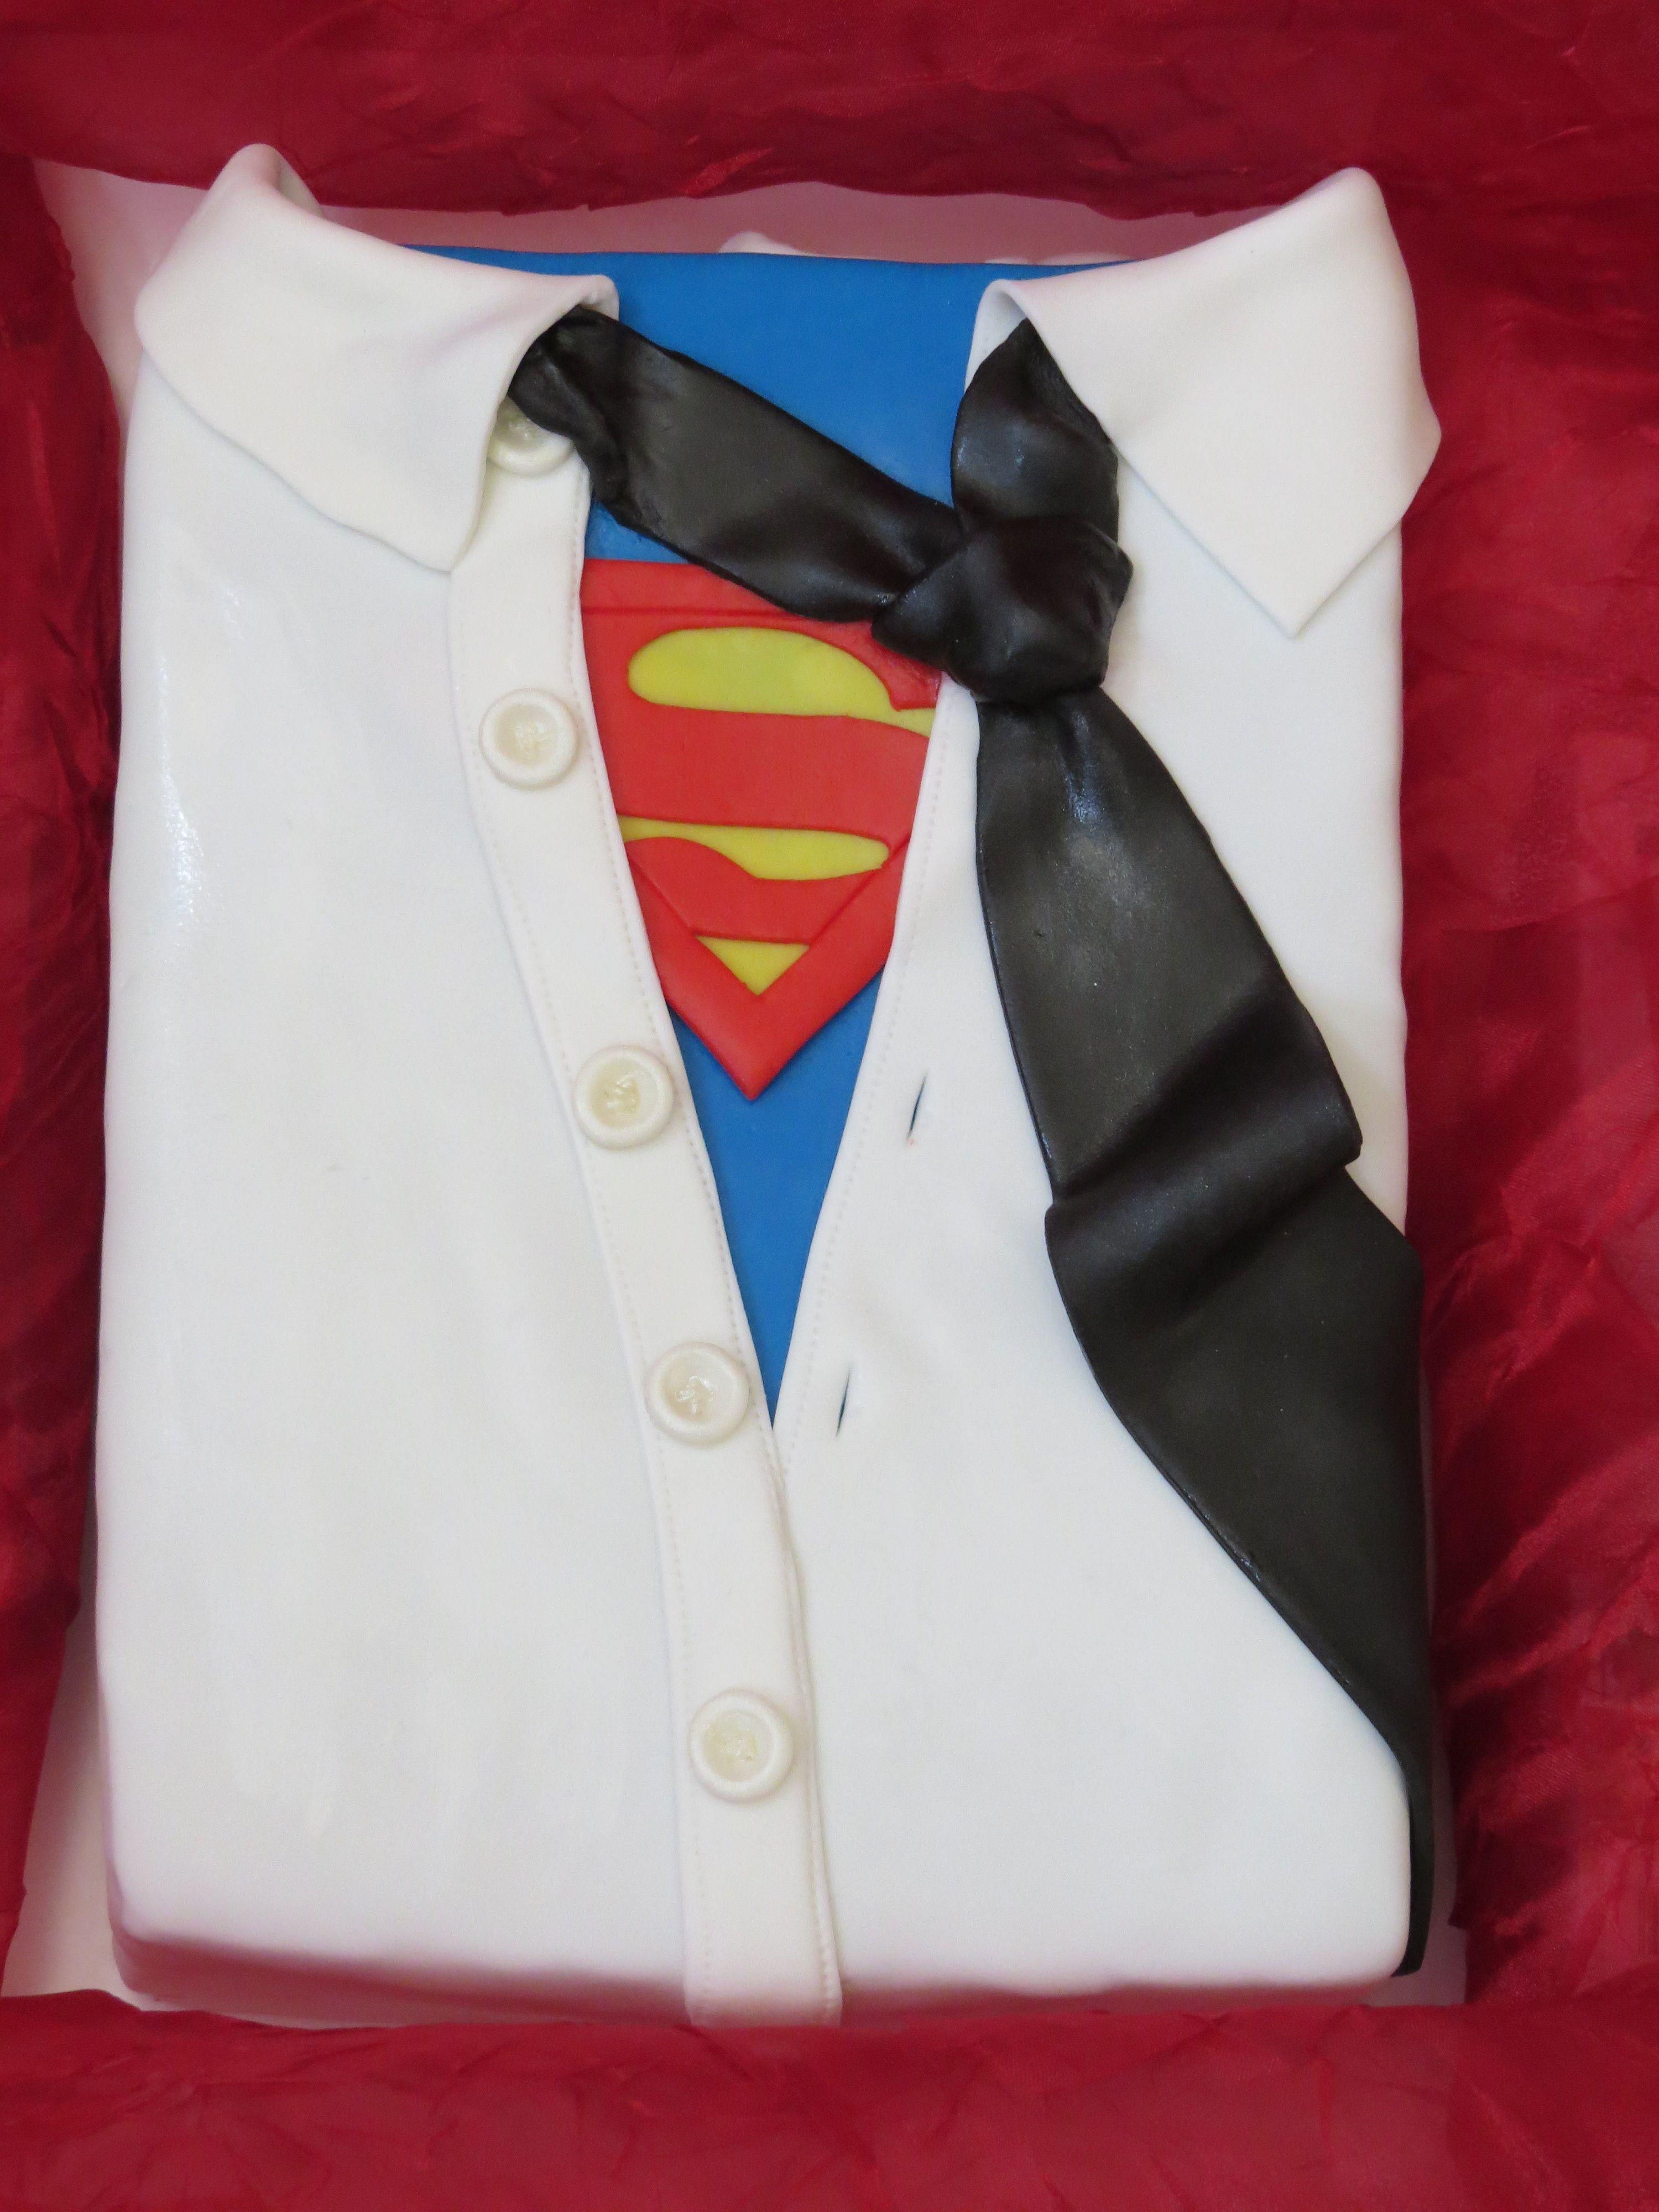 Superman Shirt And Tie Birthday Cake Special Occasion Cakes - Birthday cake shirt